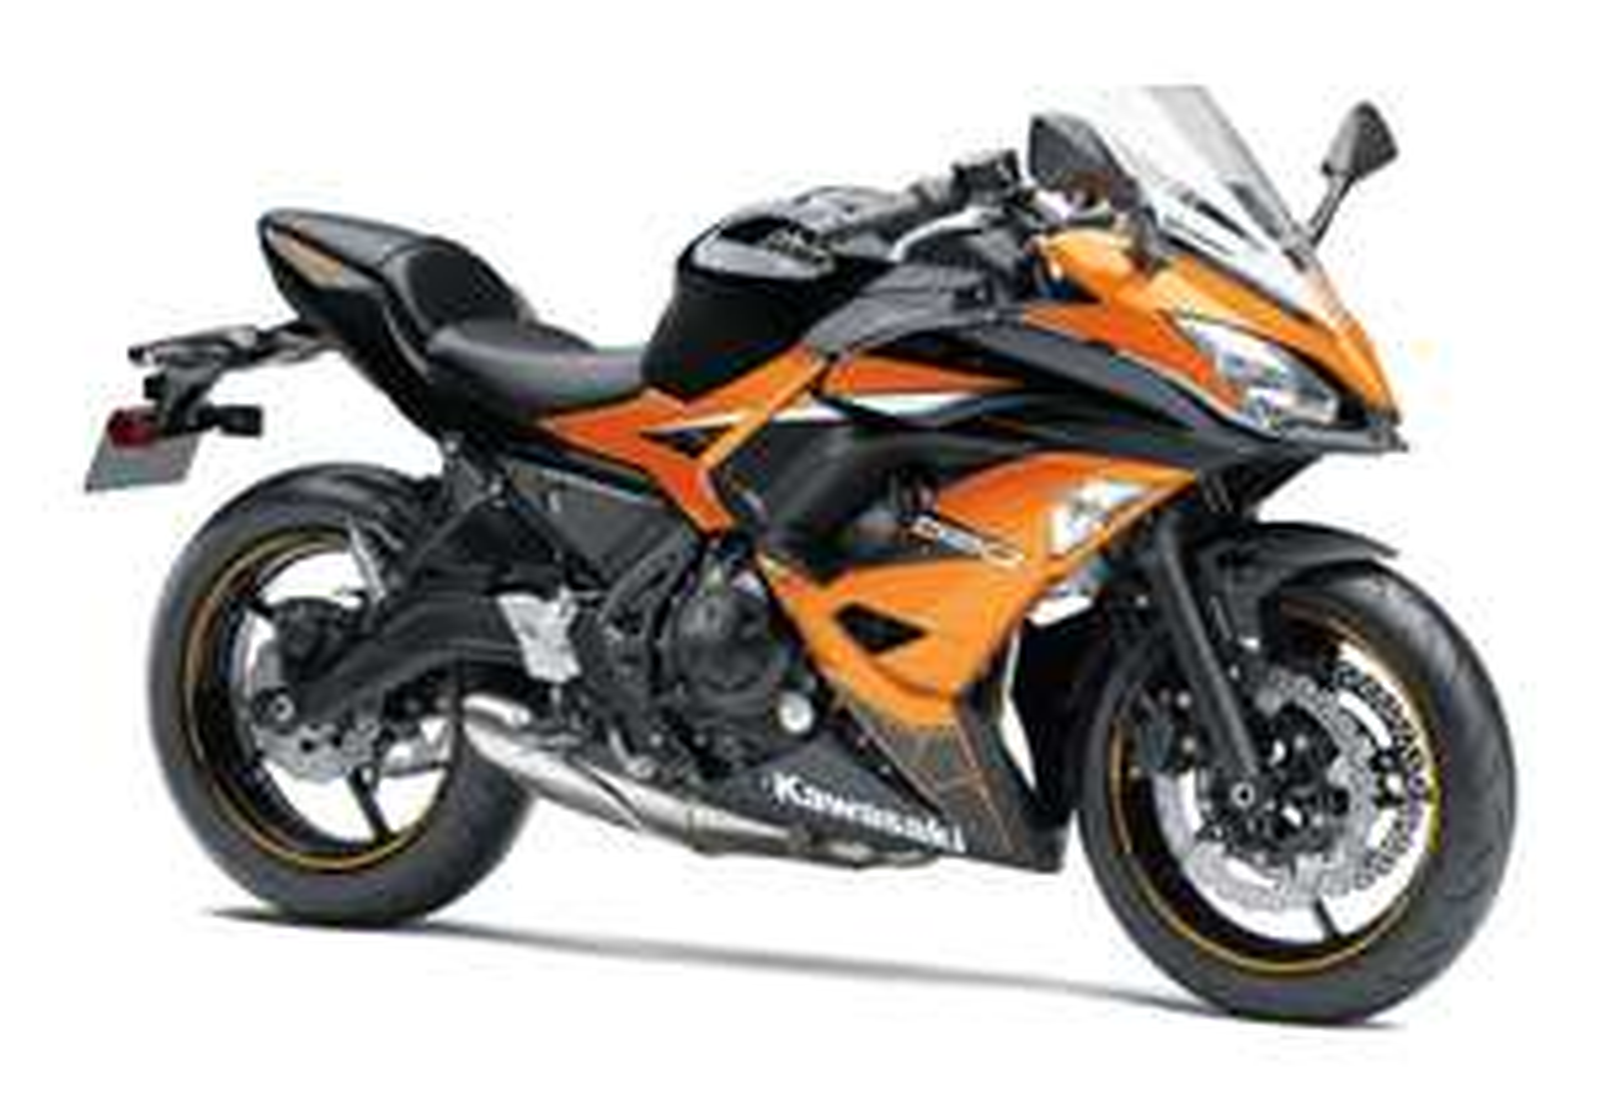 Kawasaki Ninja 650 new 0 miles £5499 @ Colchester Kawasaki